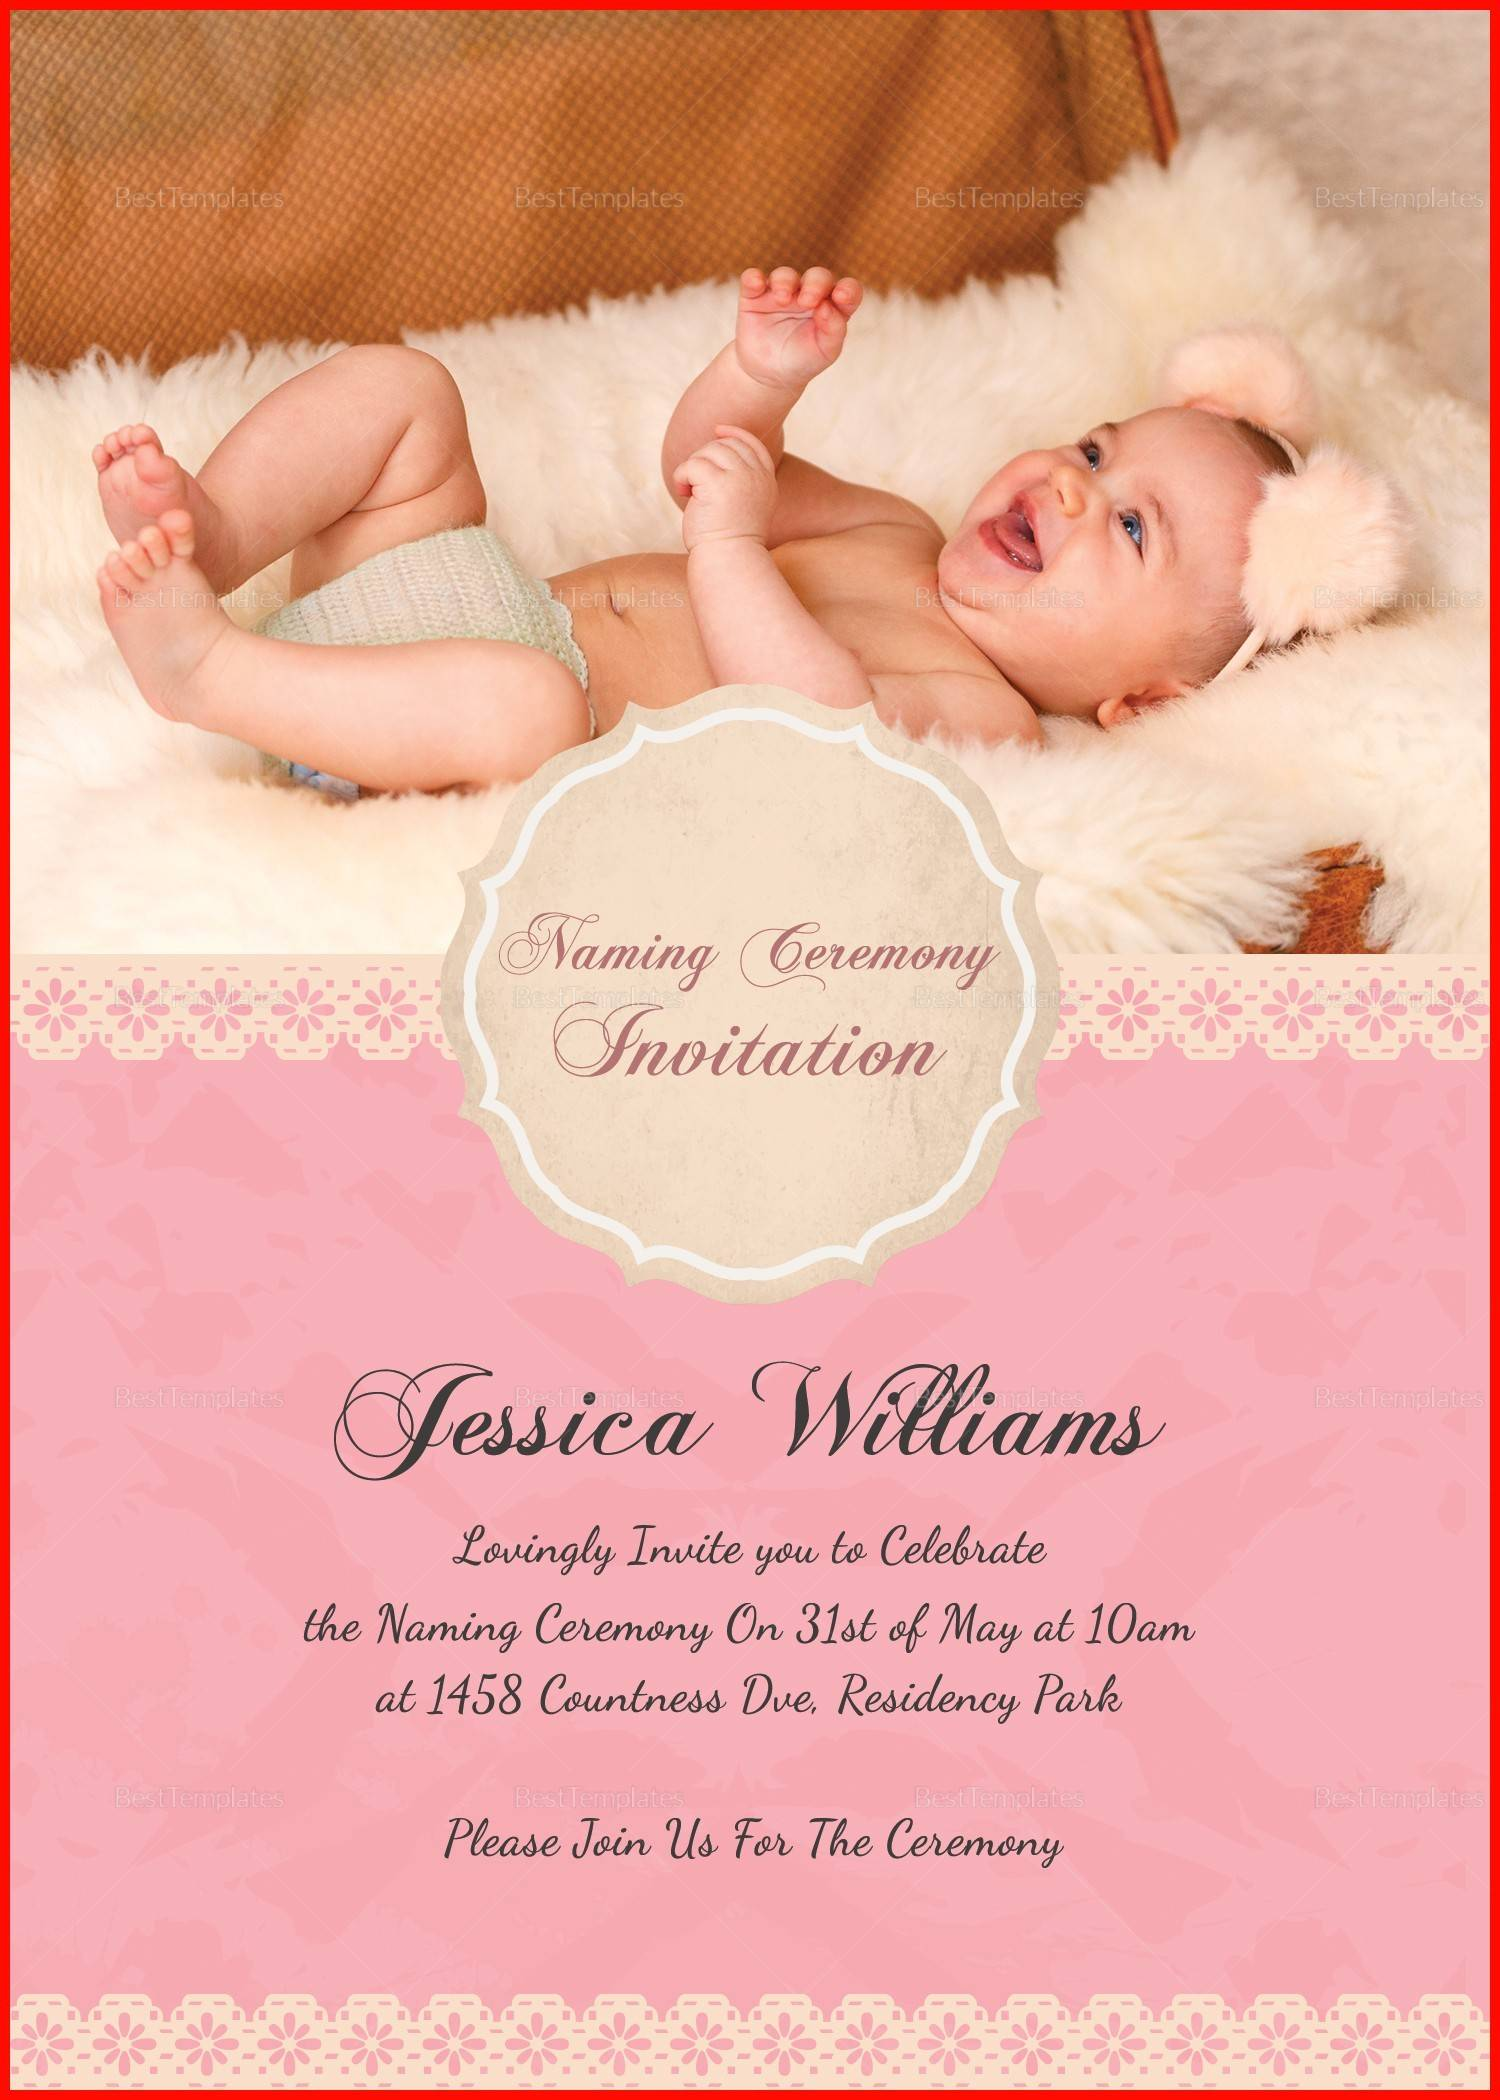 Naming Ceremony Invitation Cards